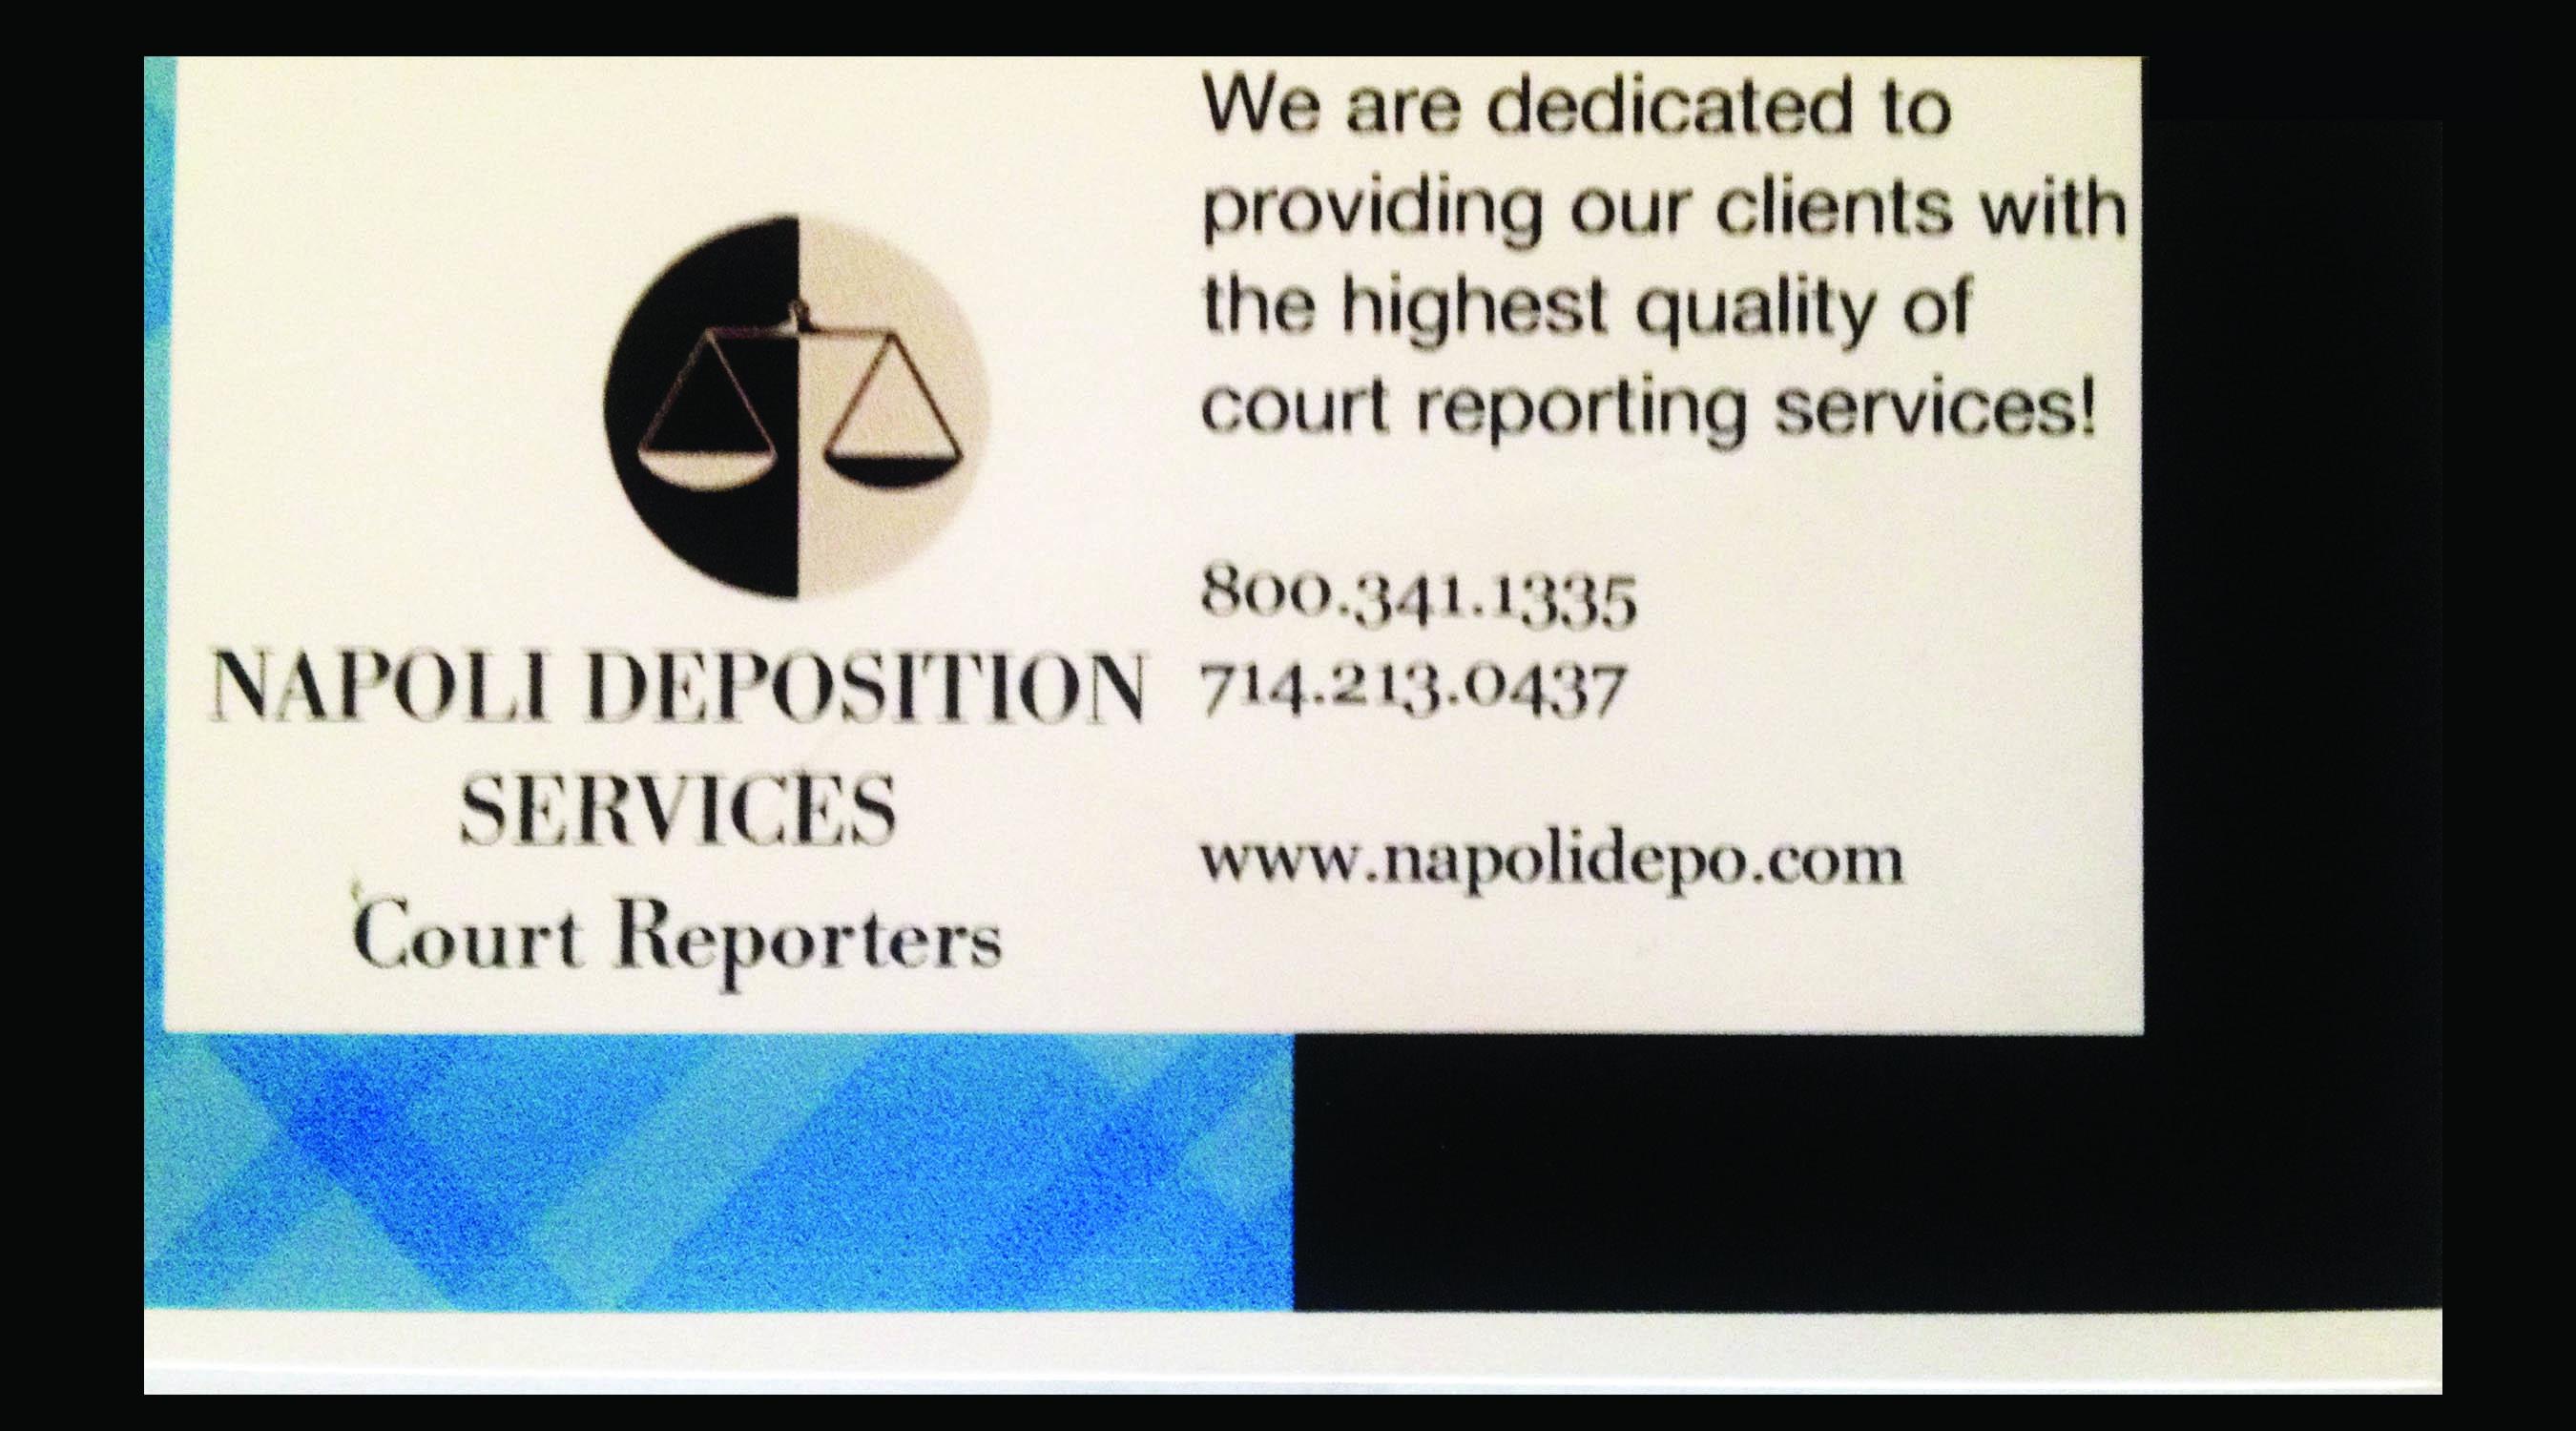 NapoliSponsor